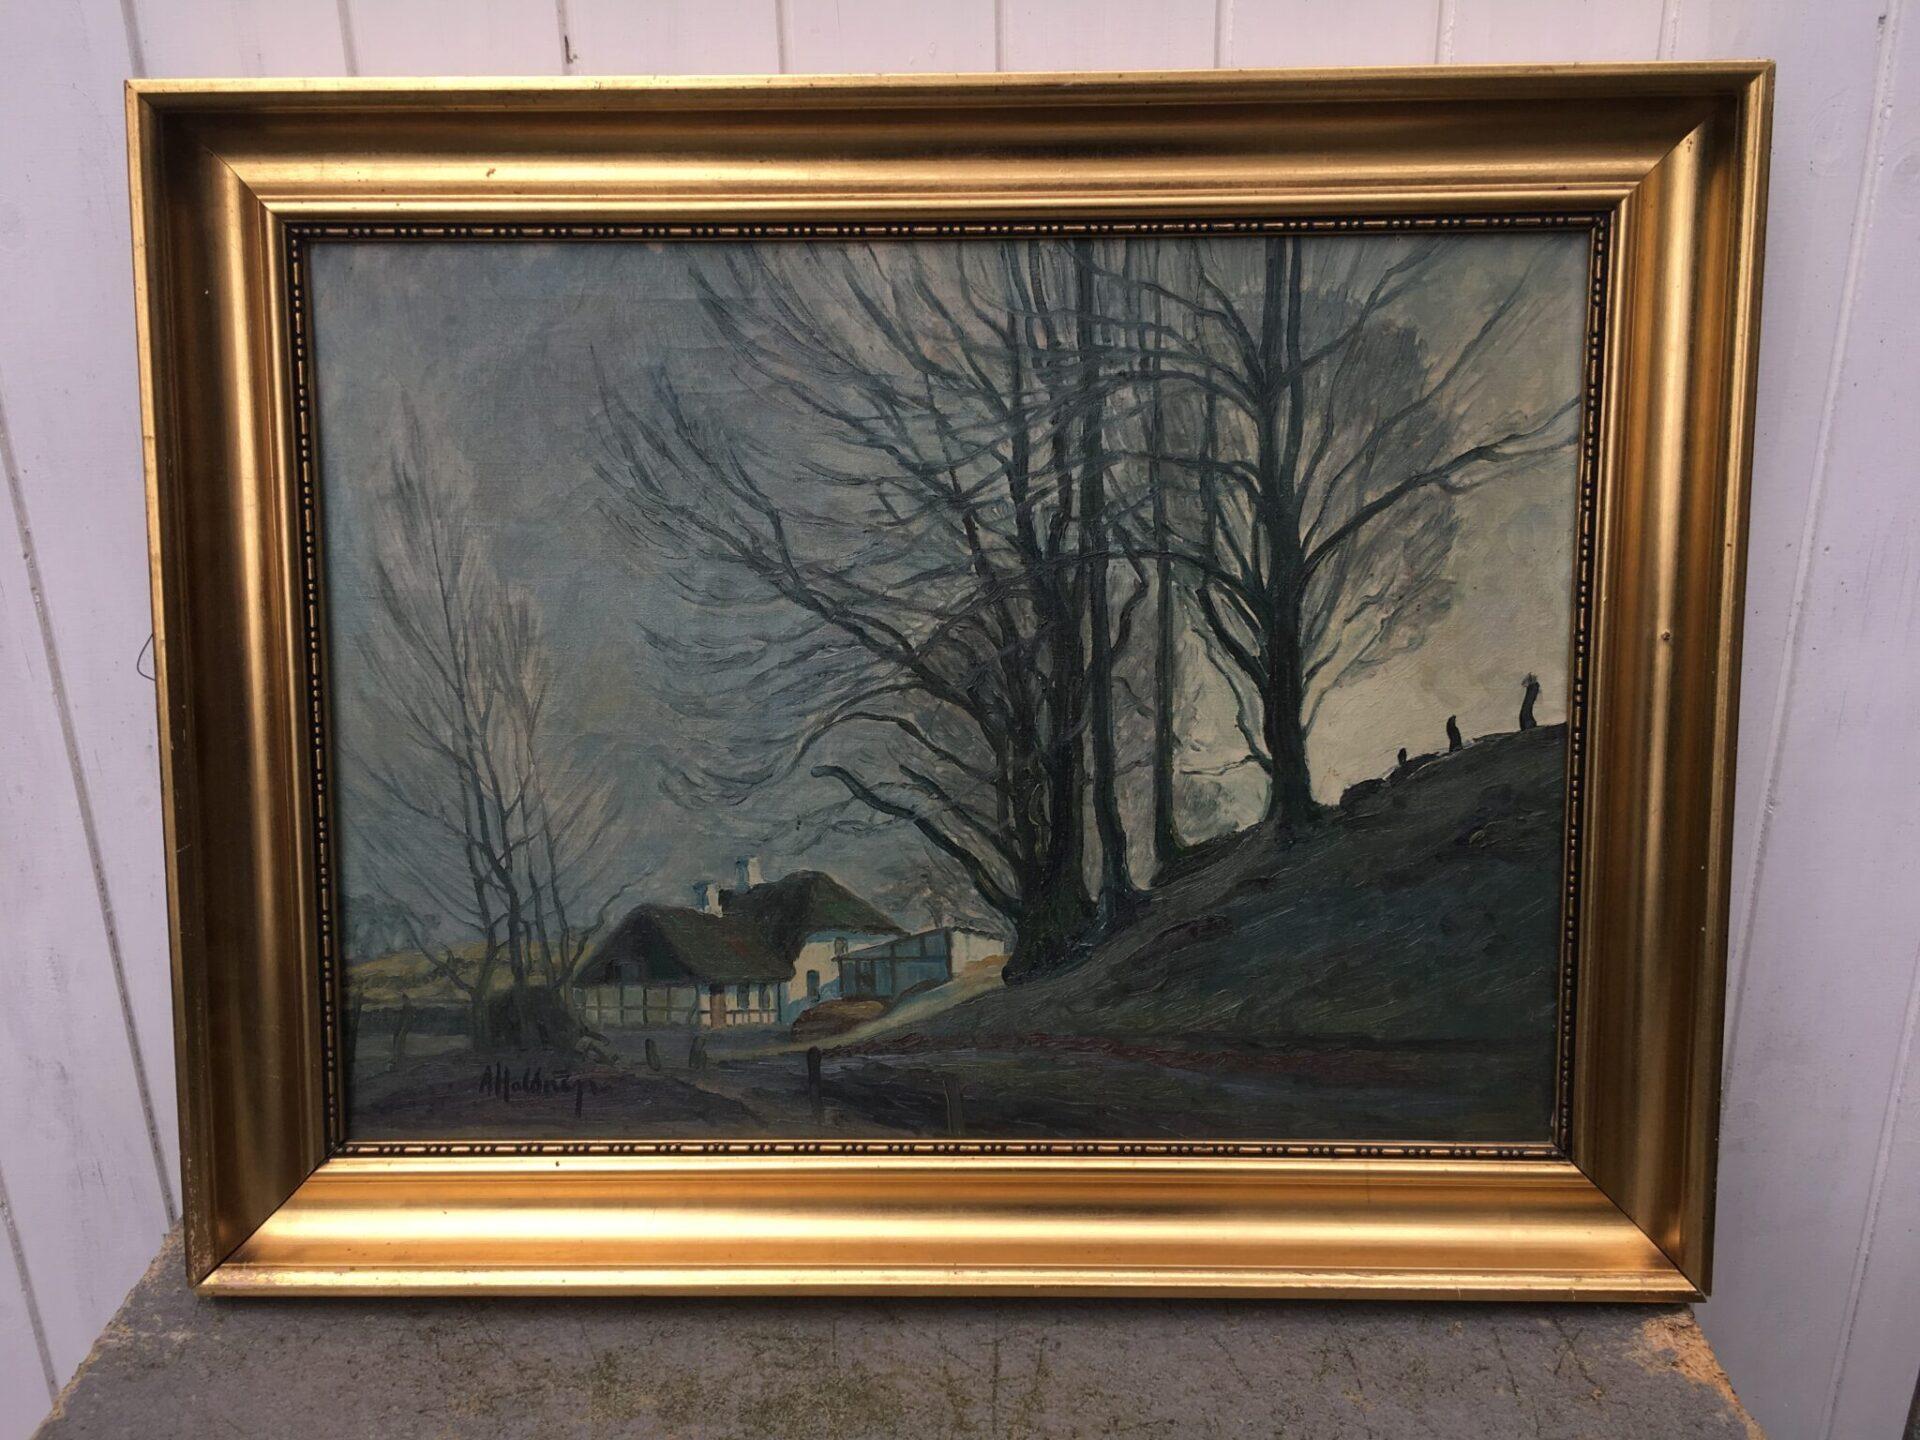 Axel Haldrup, Fredericia, velholdt maleri,(56x73 cm incl ramme). Pris 500 kr